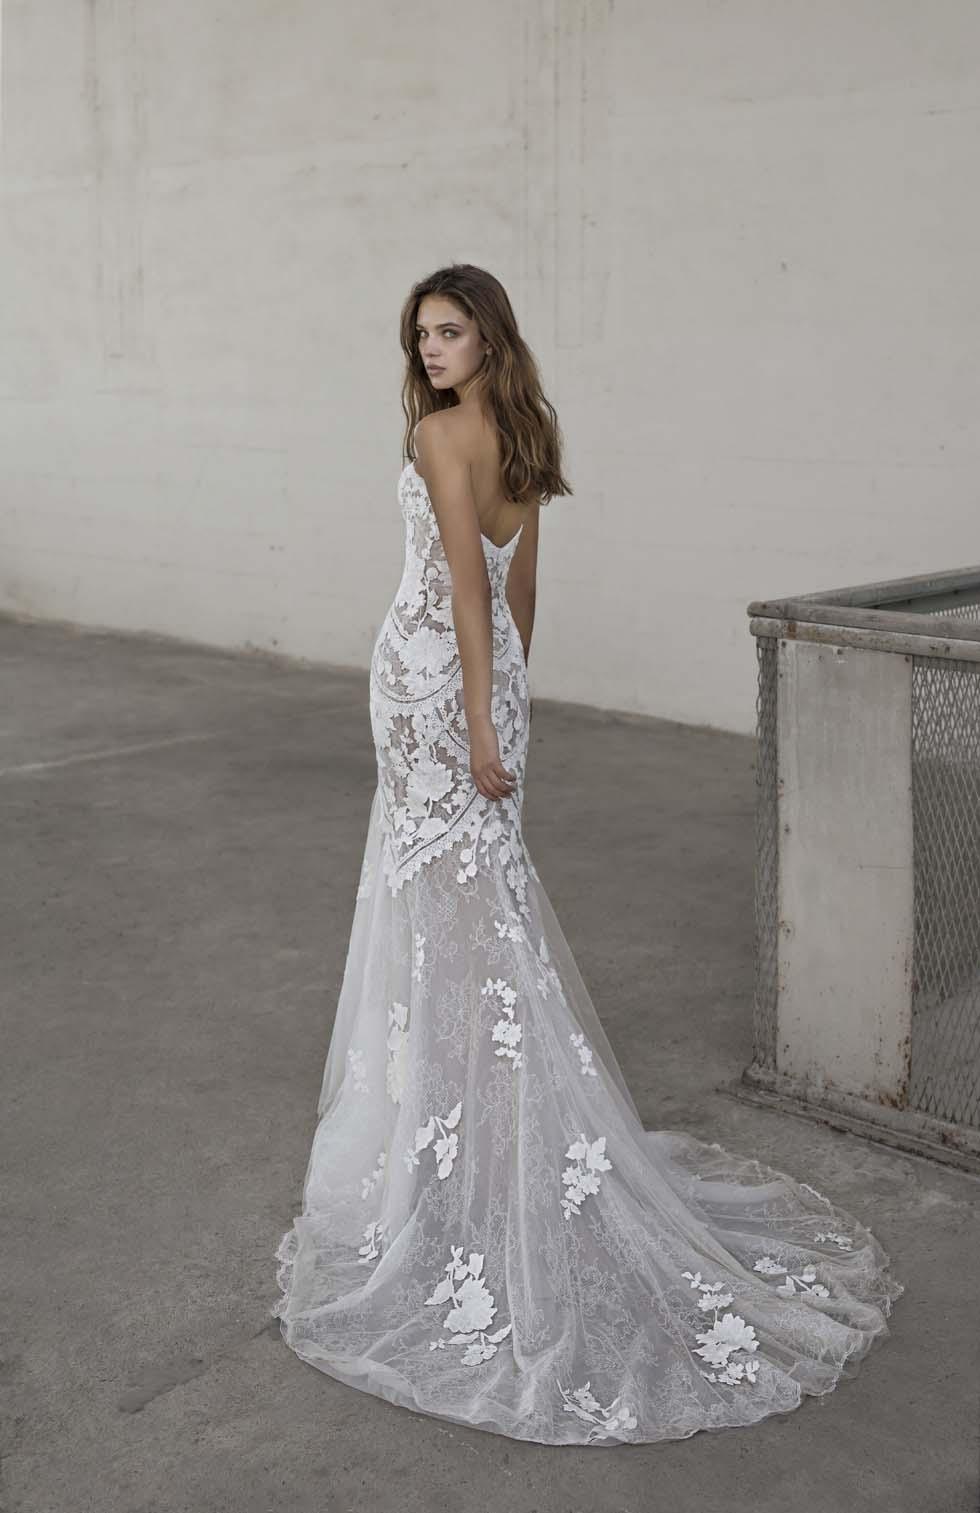 Meerjungfrauen Brautkleid Le Papillon Modeca